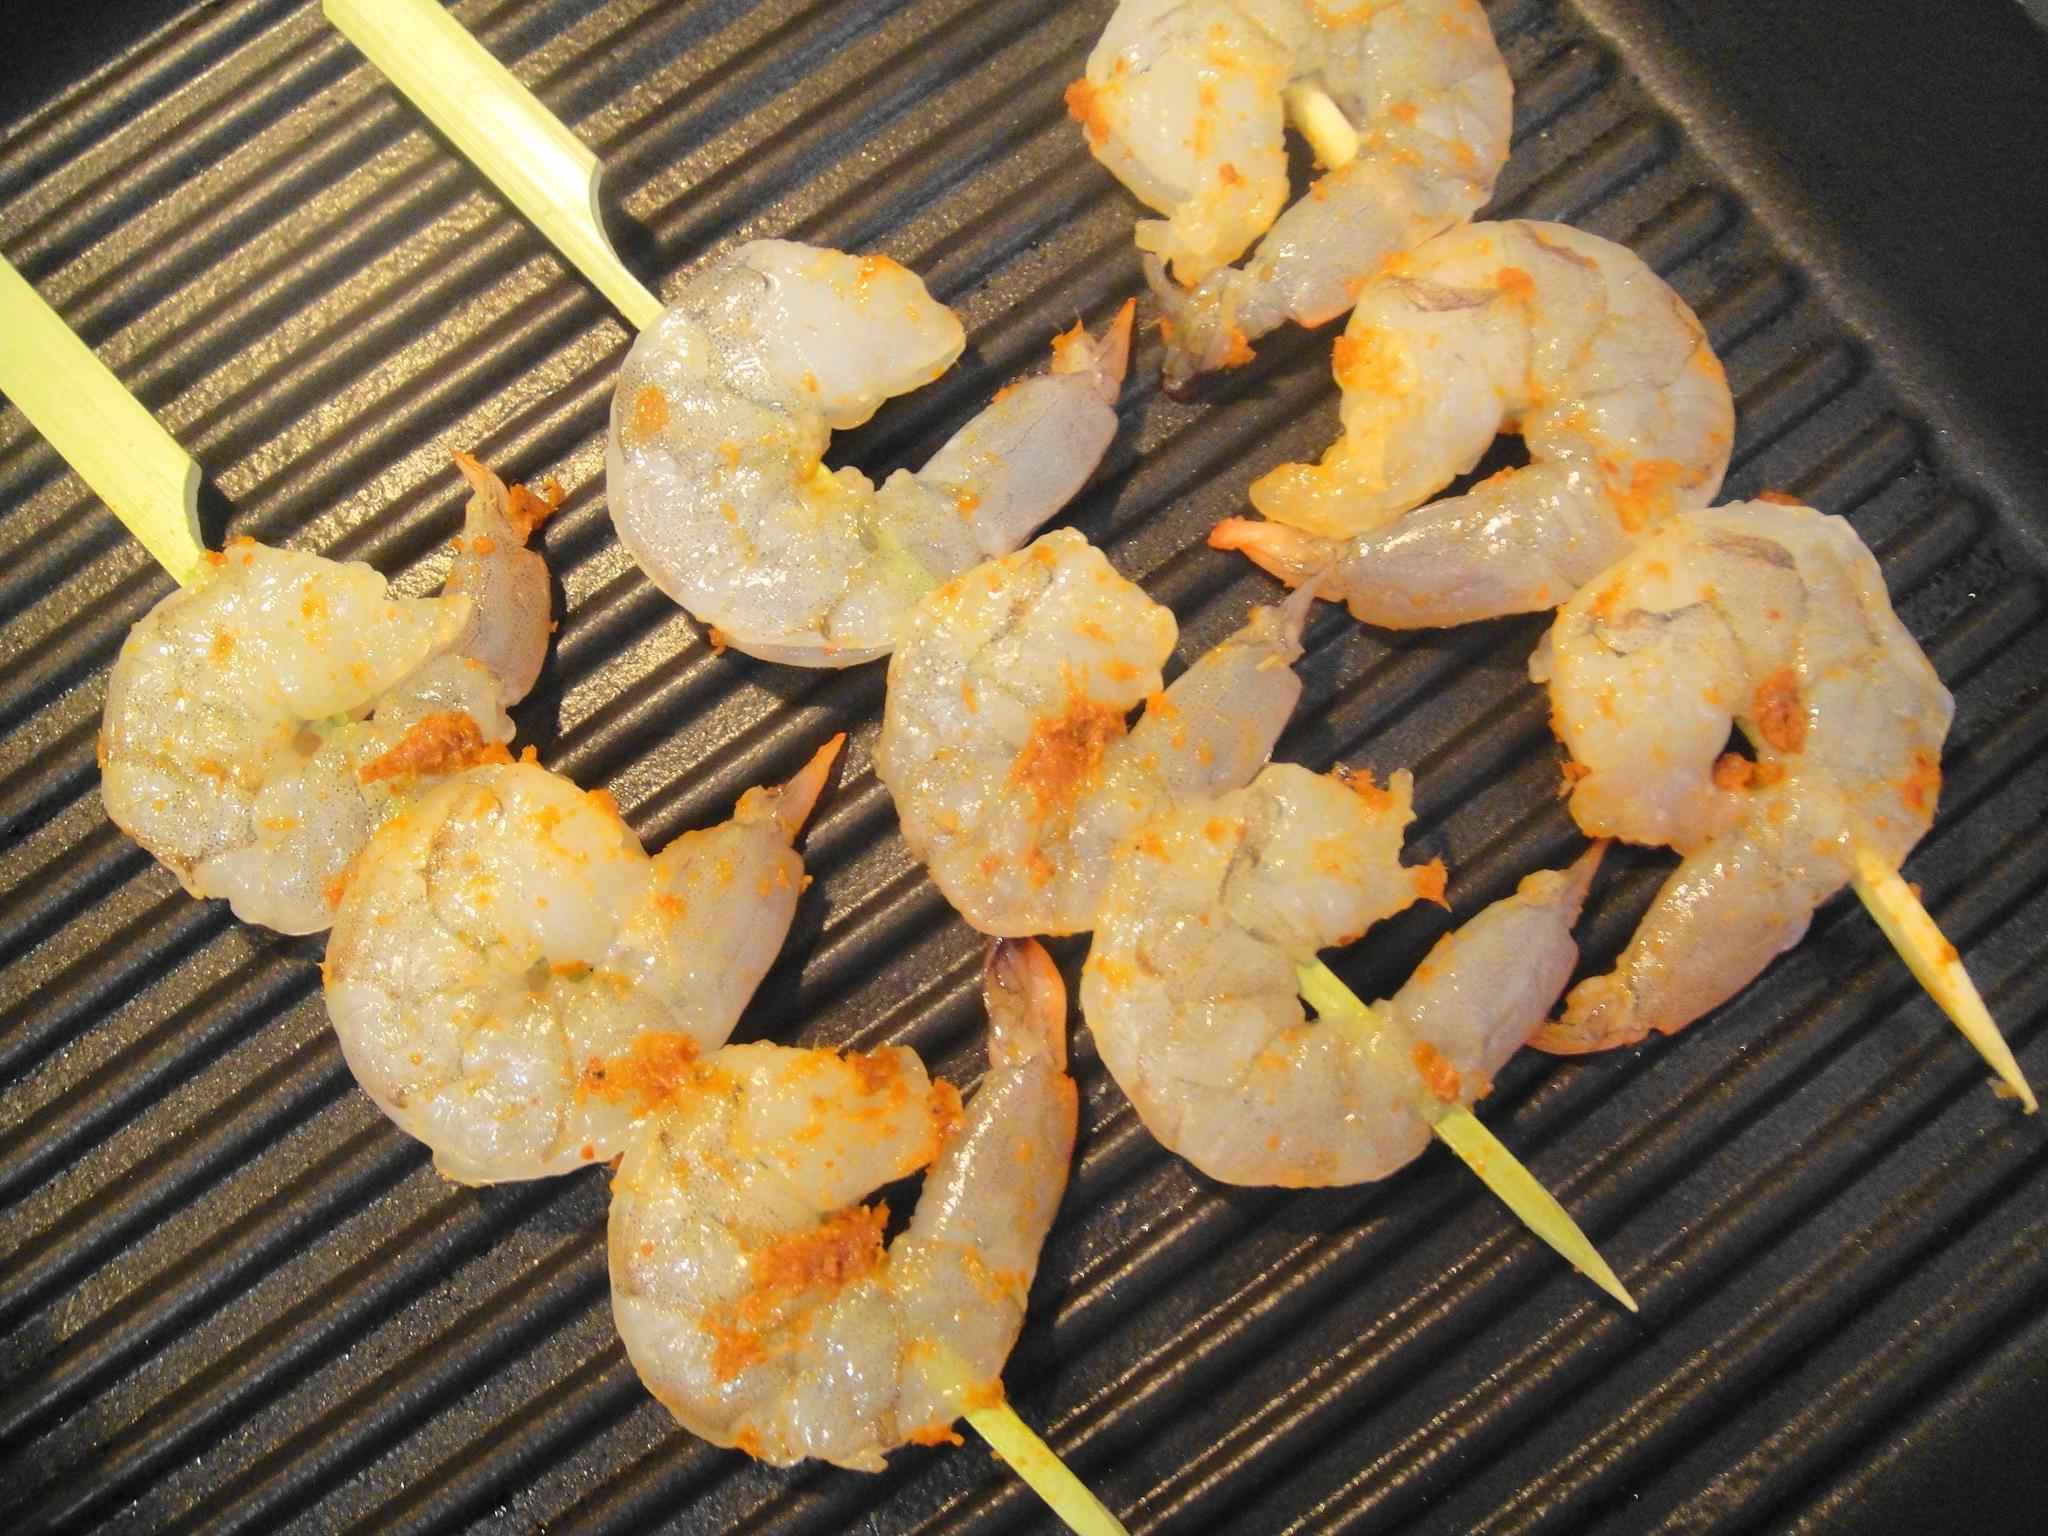 shrimp on grill